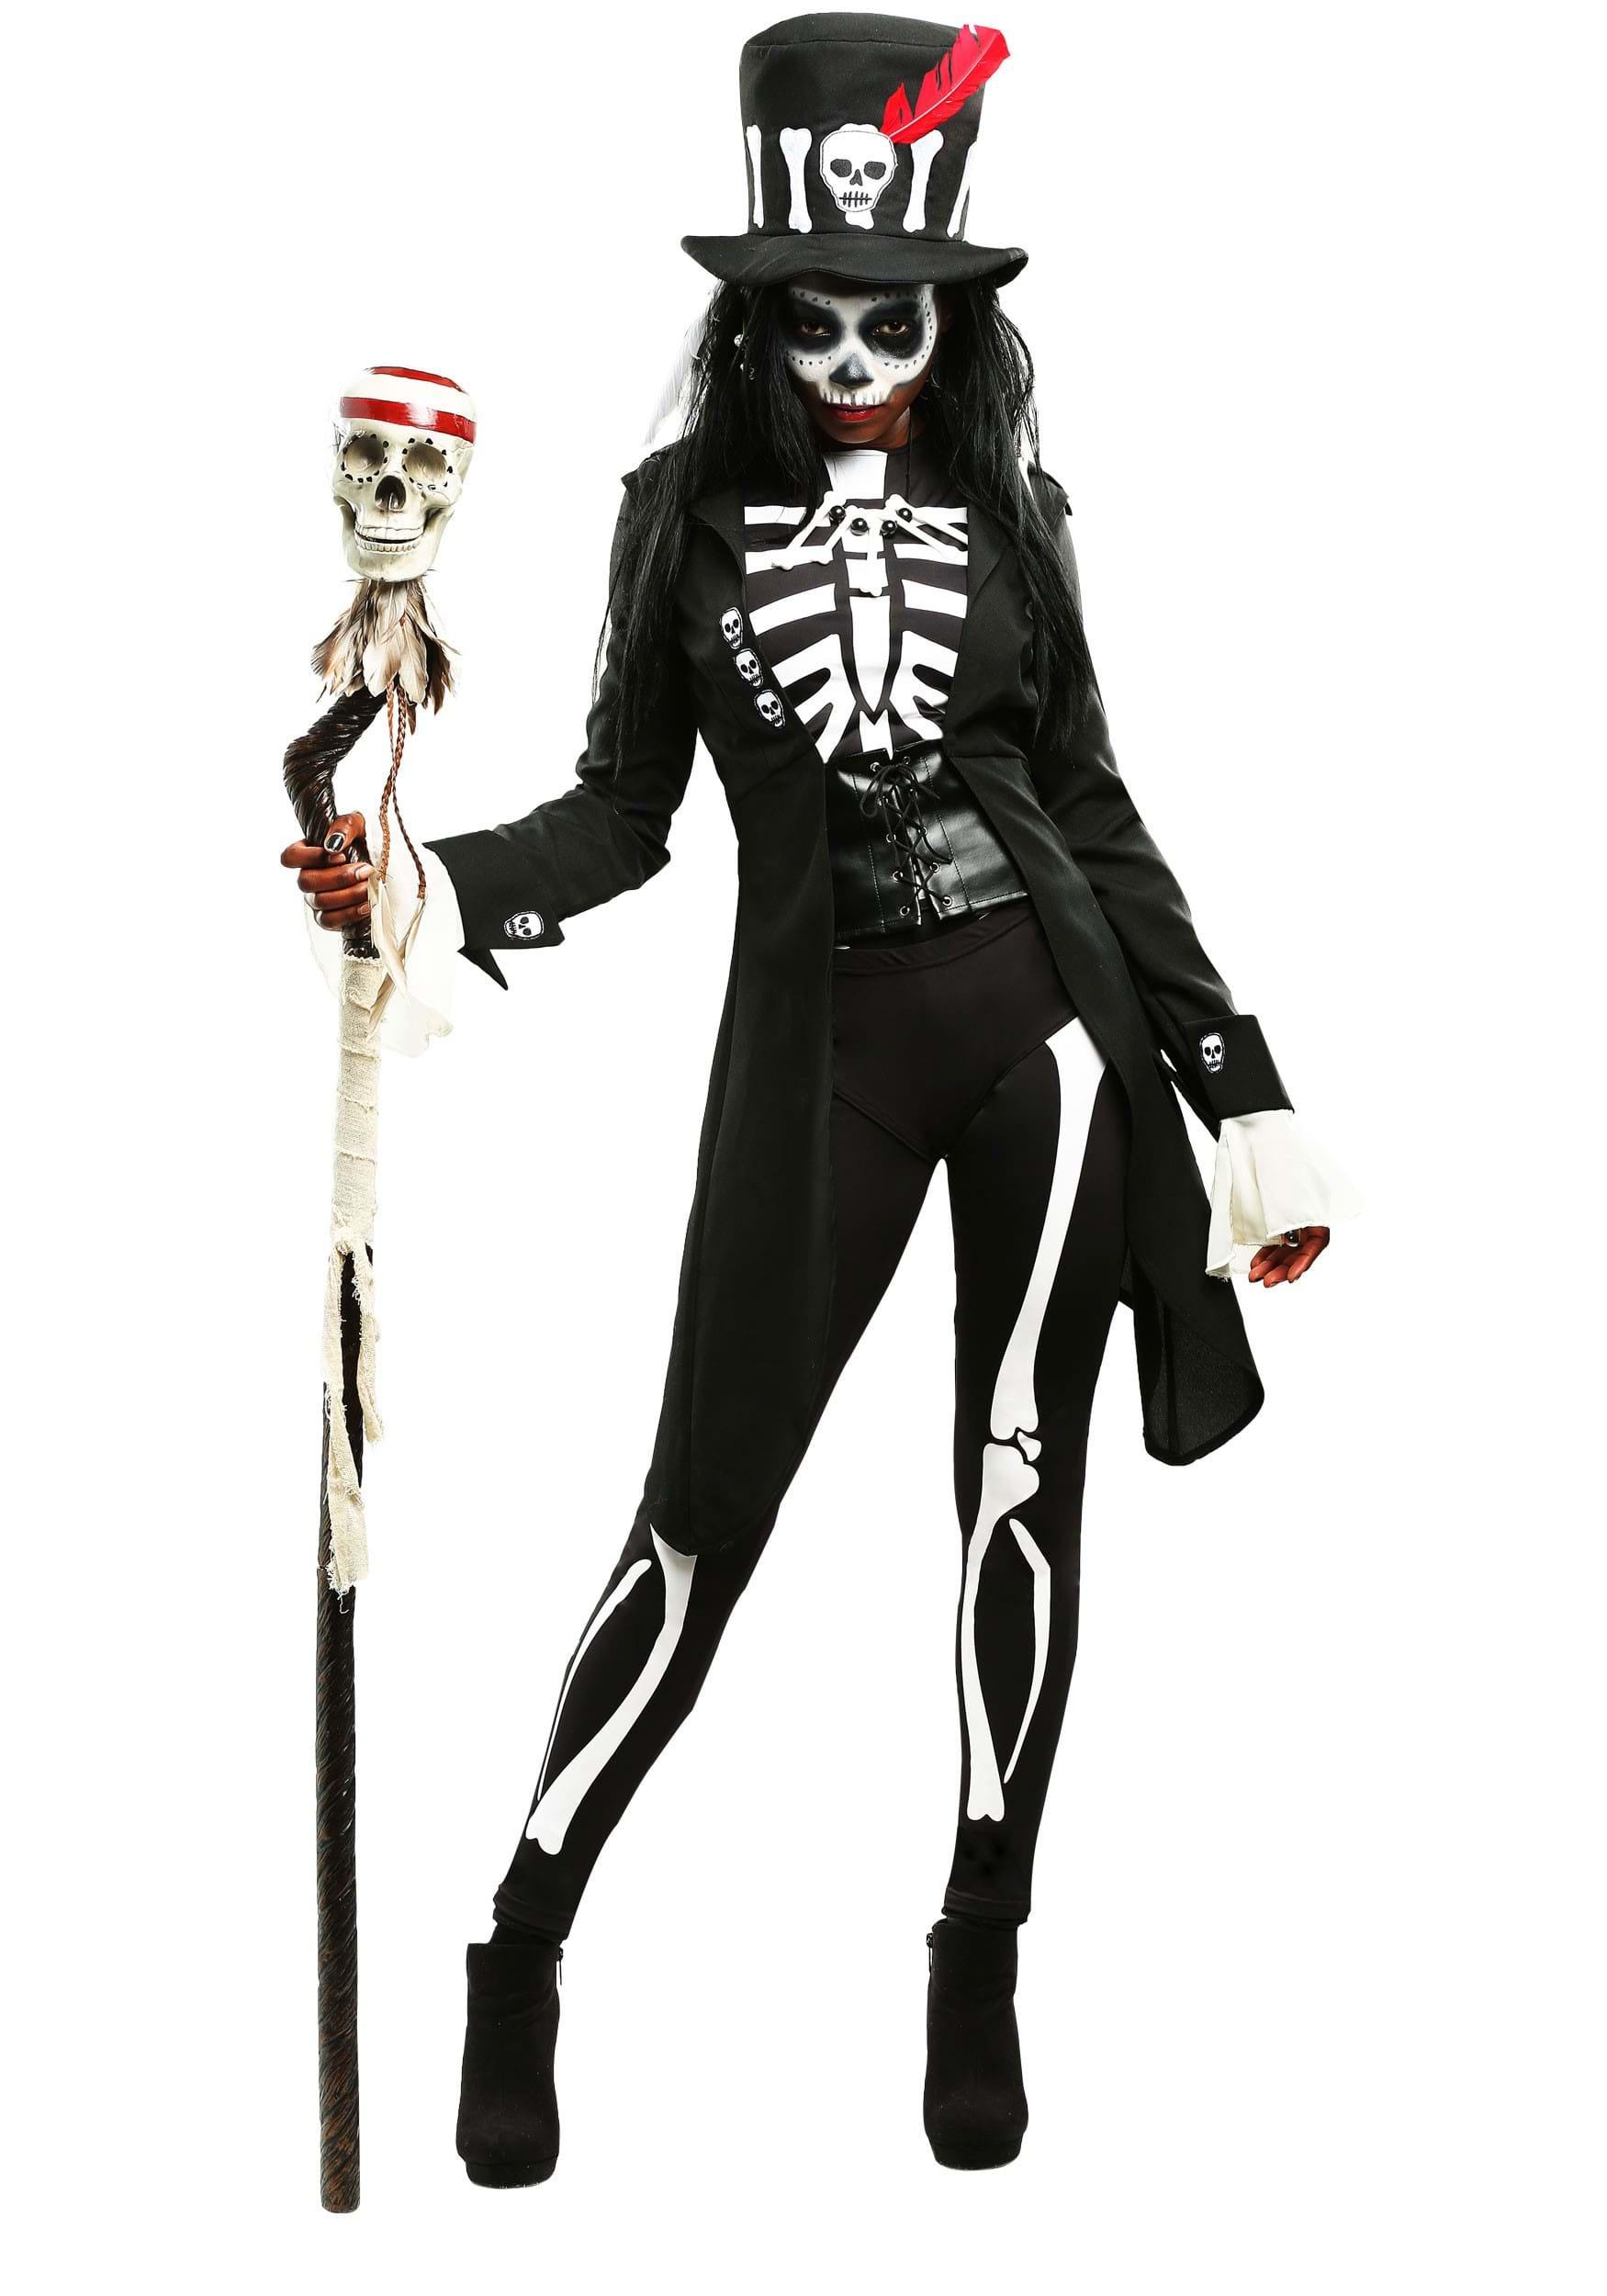 Voodoo Set Costume Accessory (US) g2smD5